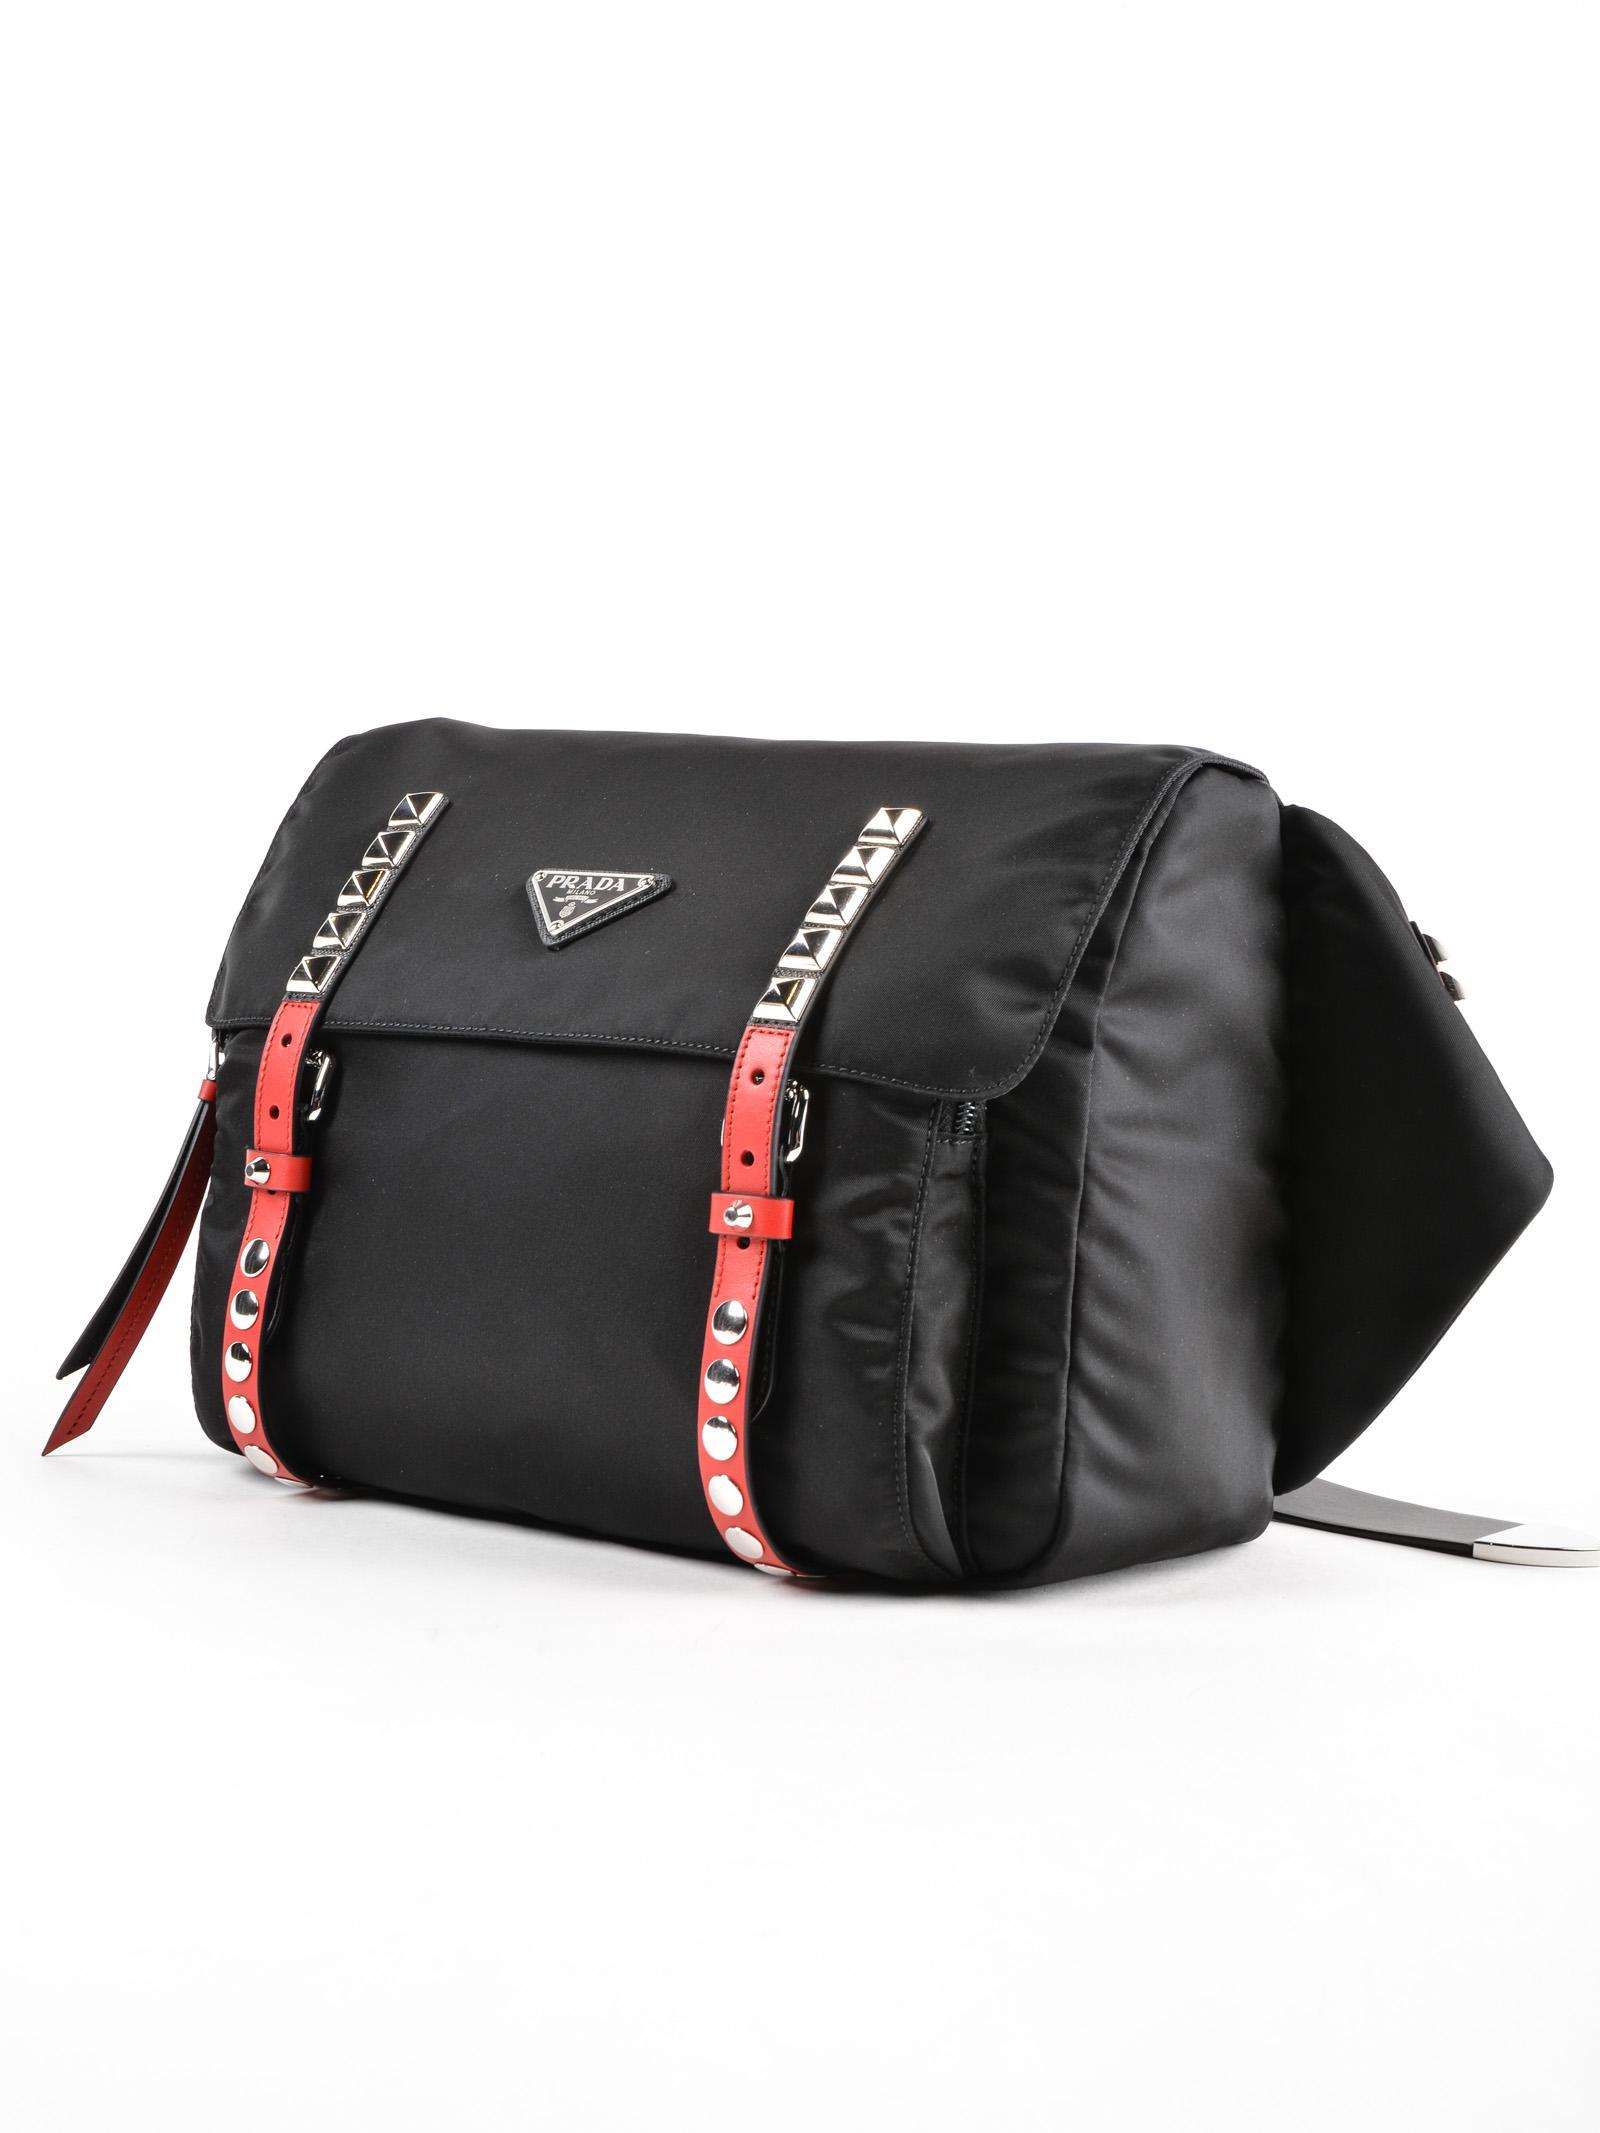 faaab8993329 Prada Belt Bag New Vela in Black - Lyst